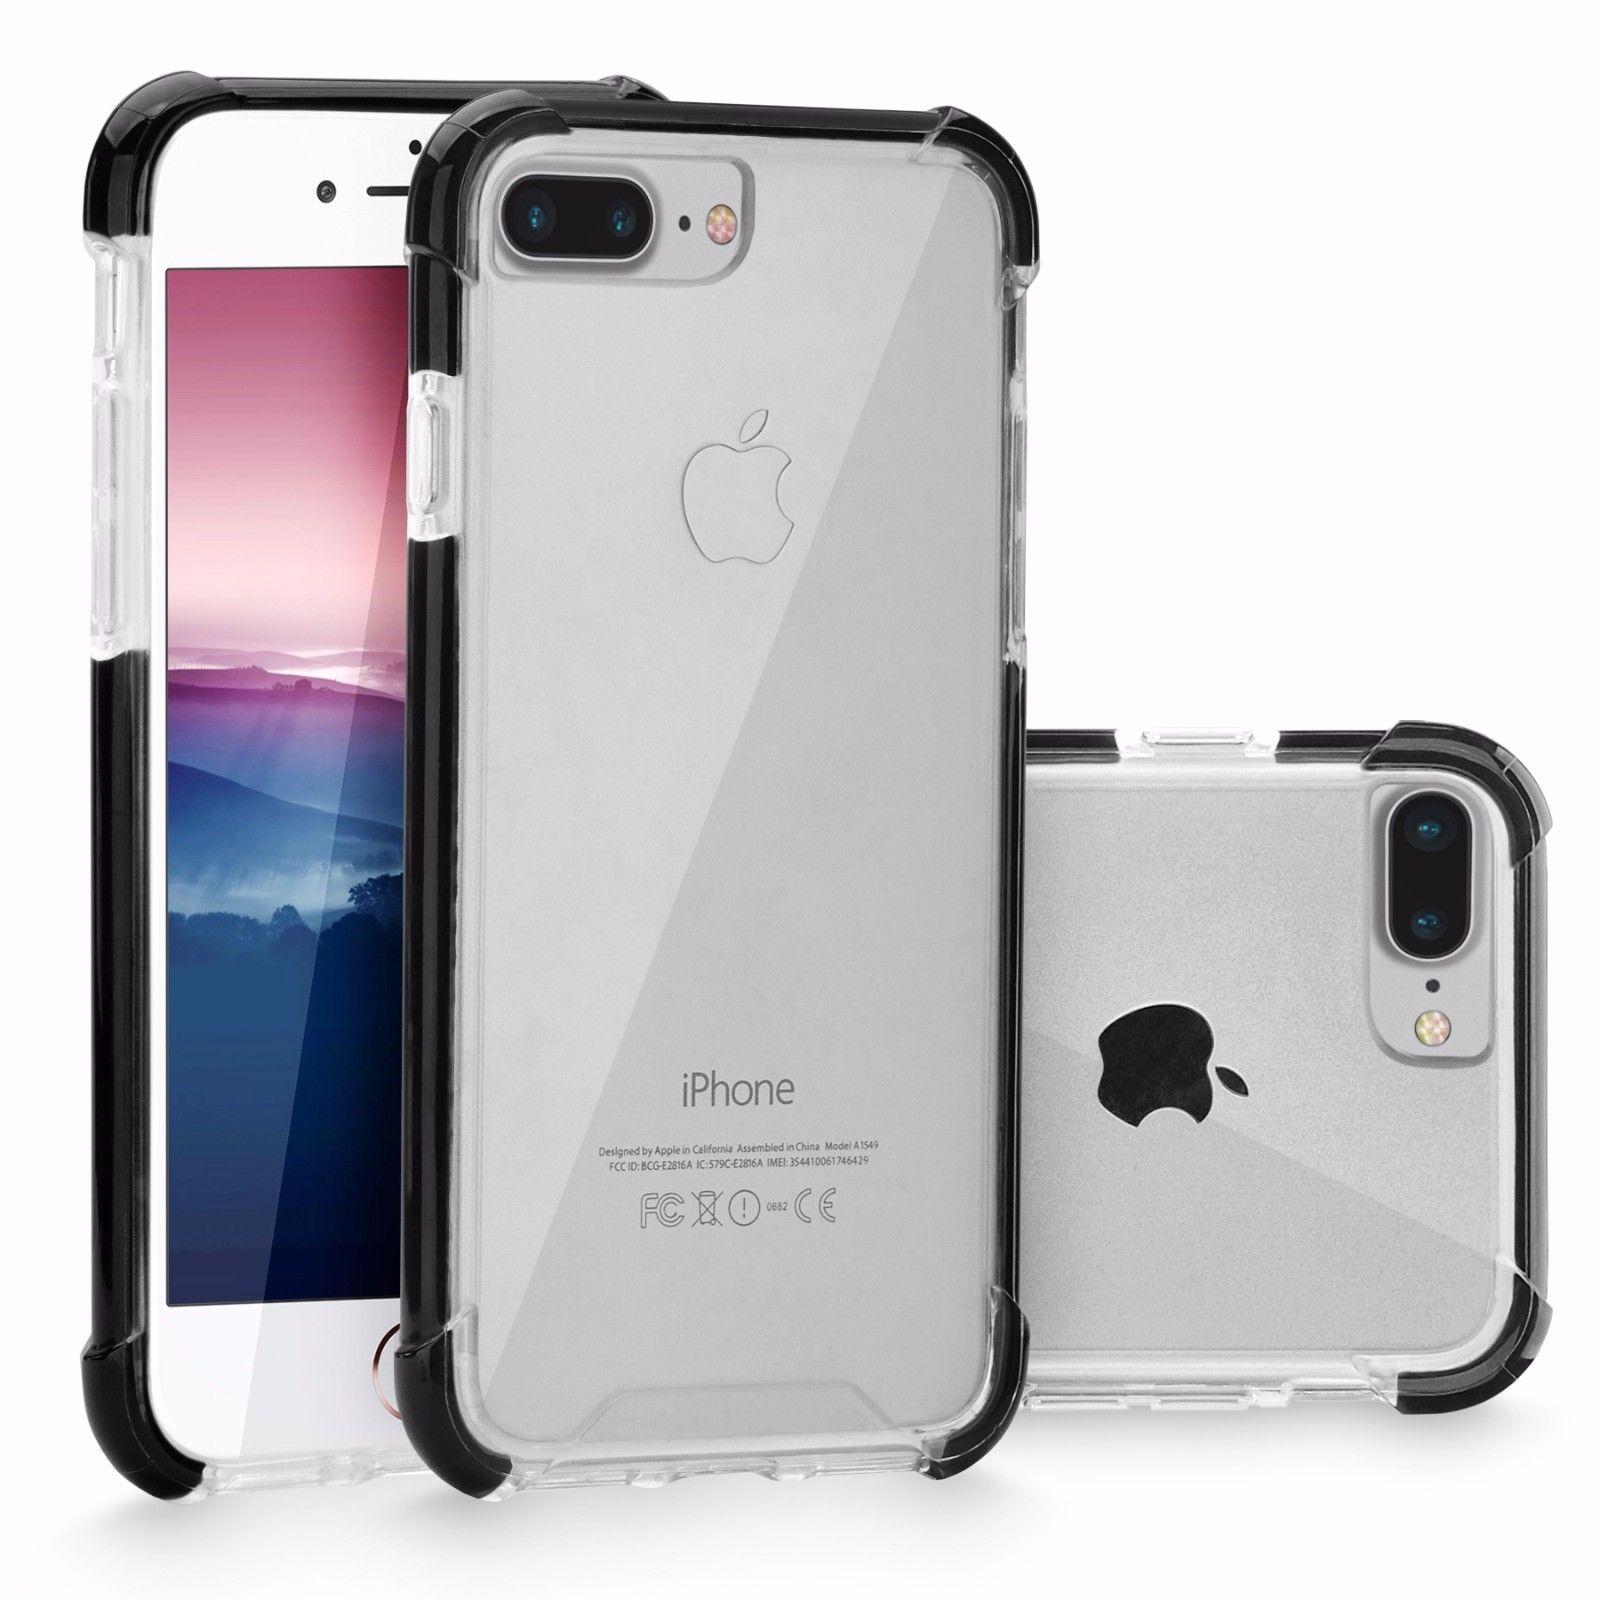 Slim Hybrid Clear Soft TPU Shockproof Hard Bumper Case For Apple iPhone 7 8 Plus for $4.99 at eBay.com